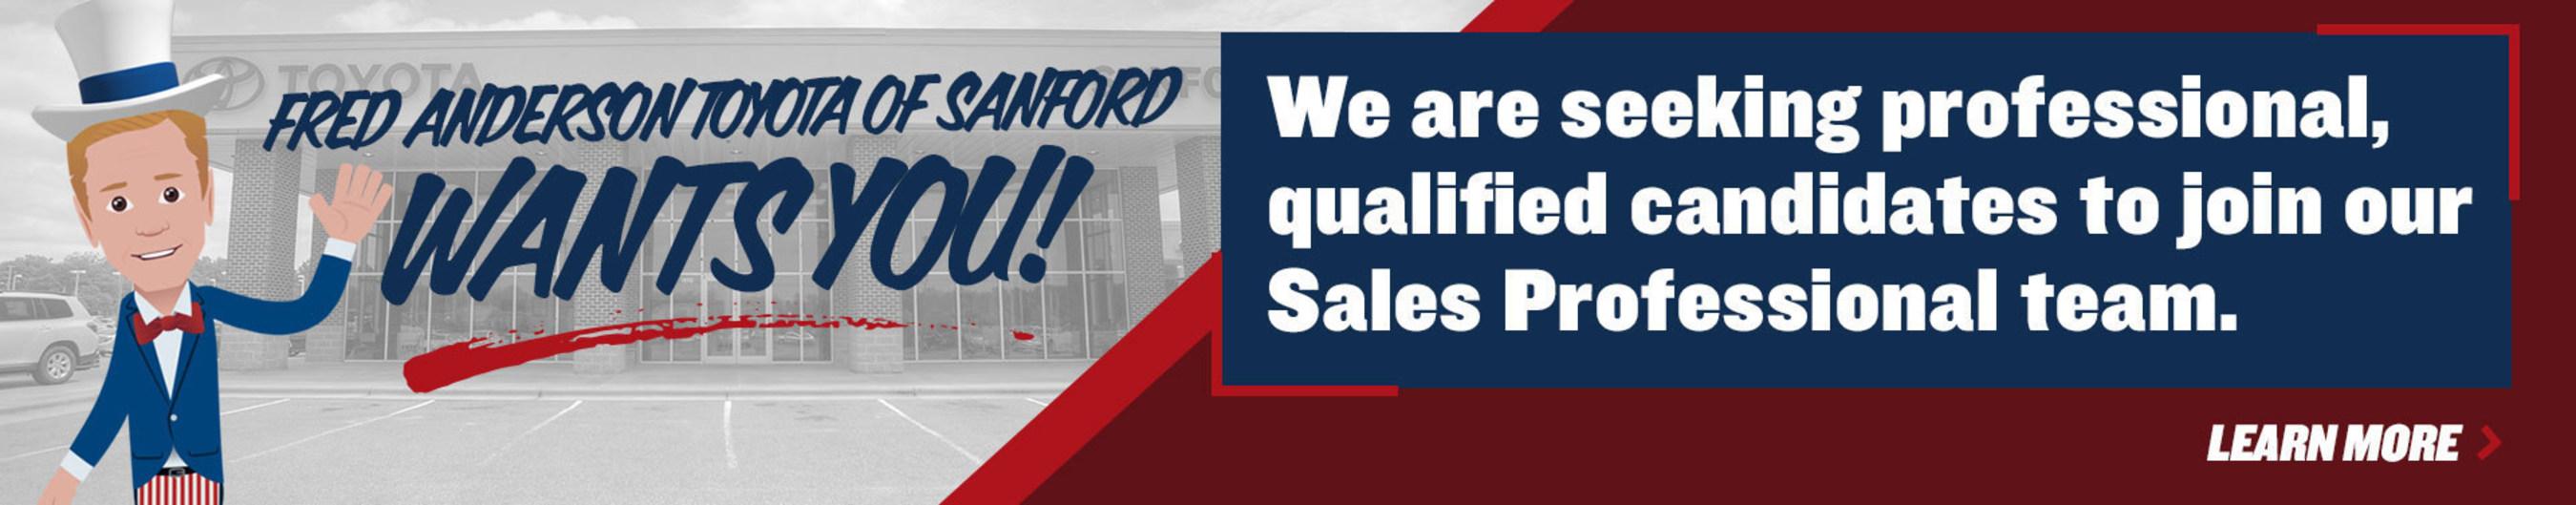 Sanford, North Carolina dealership seeks to fill sales positions